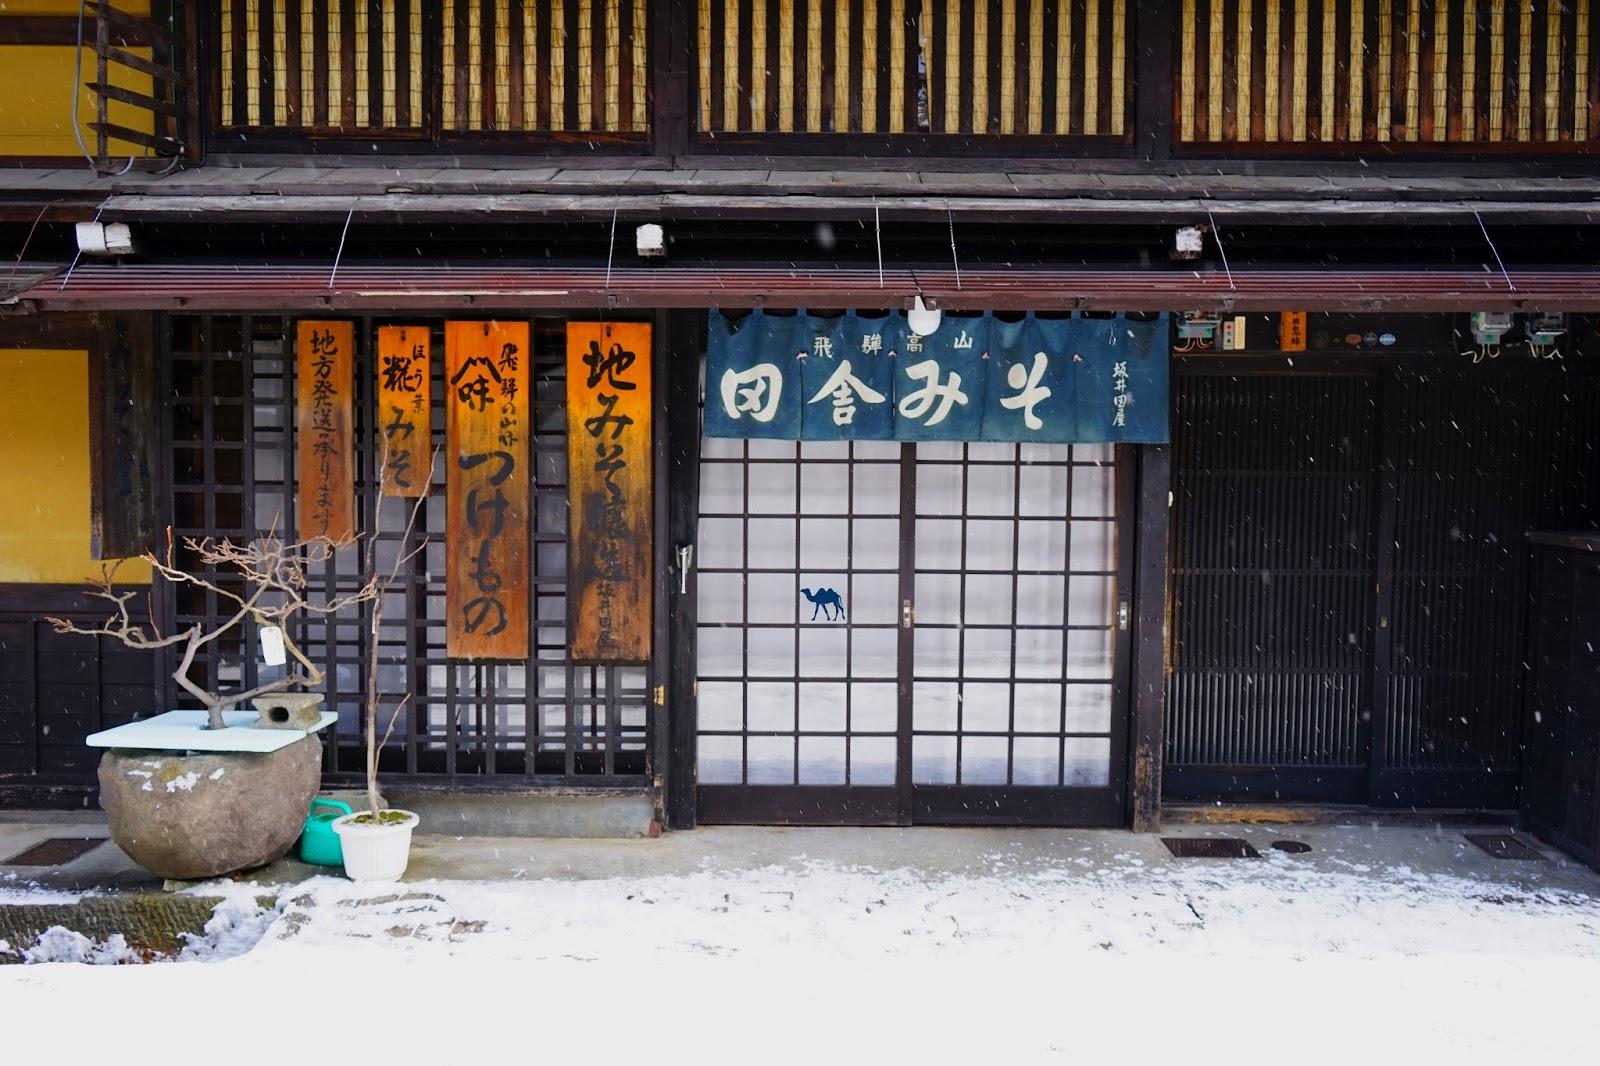 Entrée Maison Takayama - Le Chameau Bleu